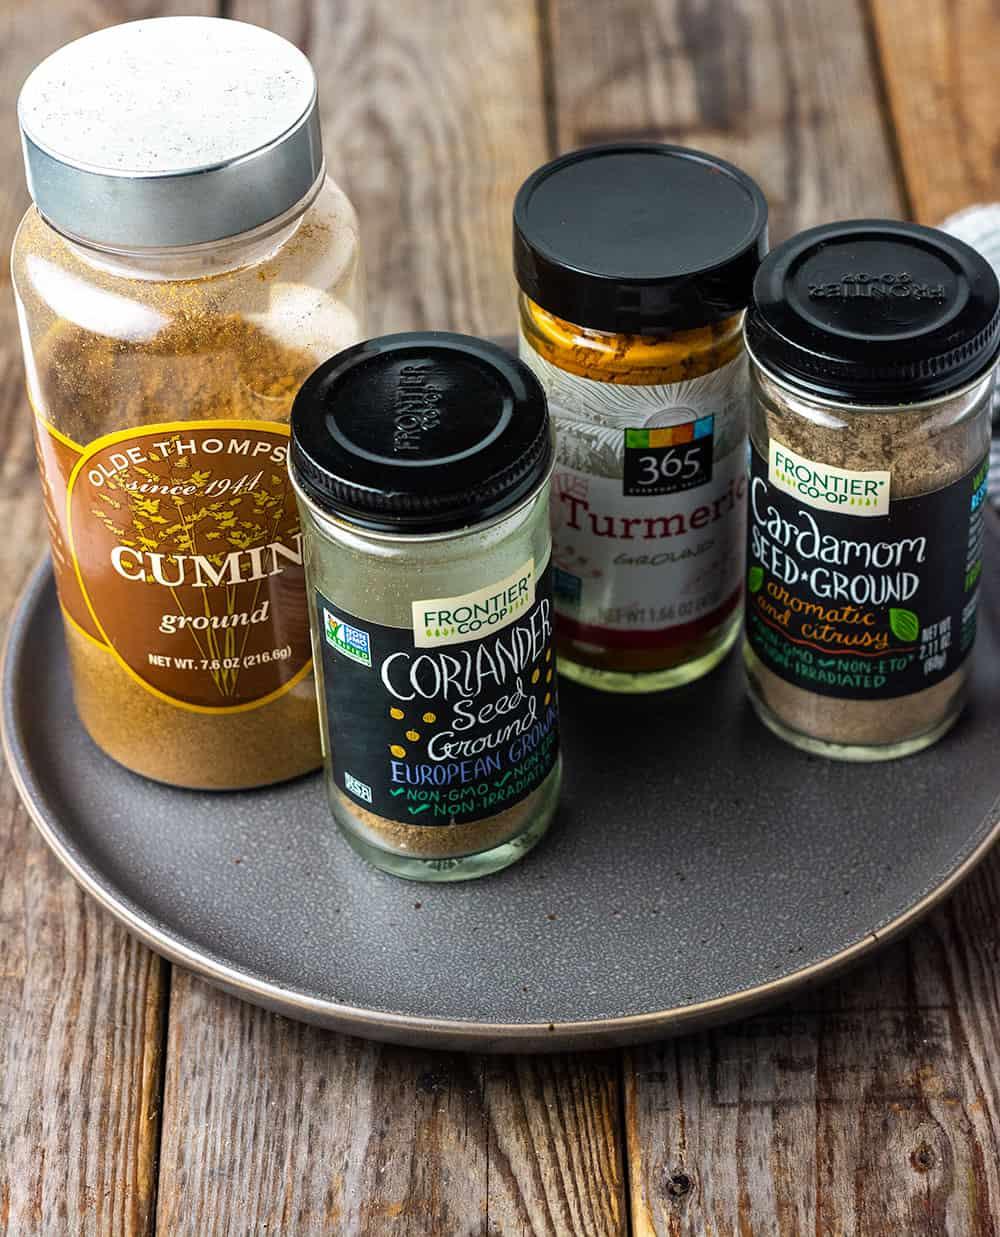 Curry Powder ingredients, turmeric, coriander, cumin, cardamom